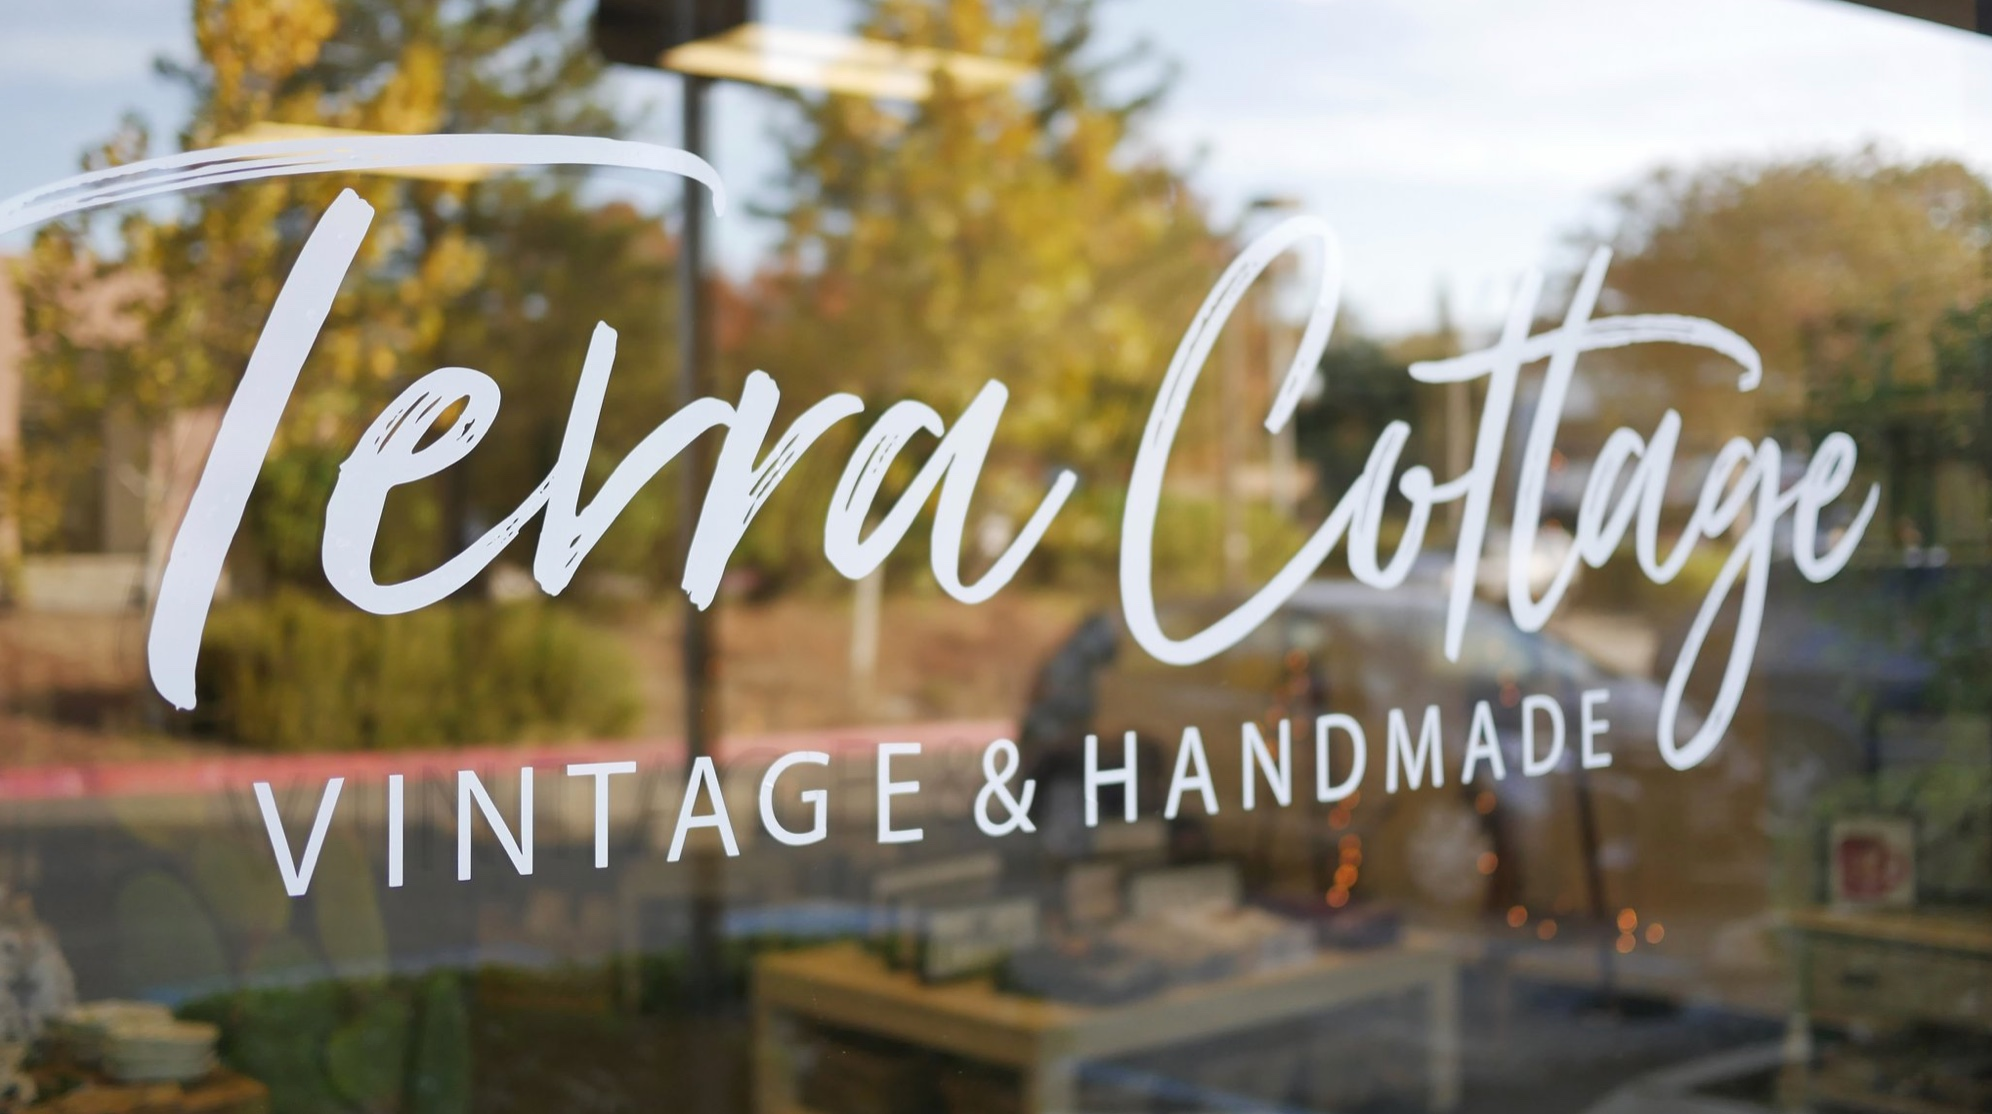 Terra Cottage - 8405 Sierra College Blvd Suite BRoseville, CA 95661Open 11-6 Wed-Fri & 9-6 Sat-Sunhttps://terracottageshop.com